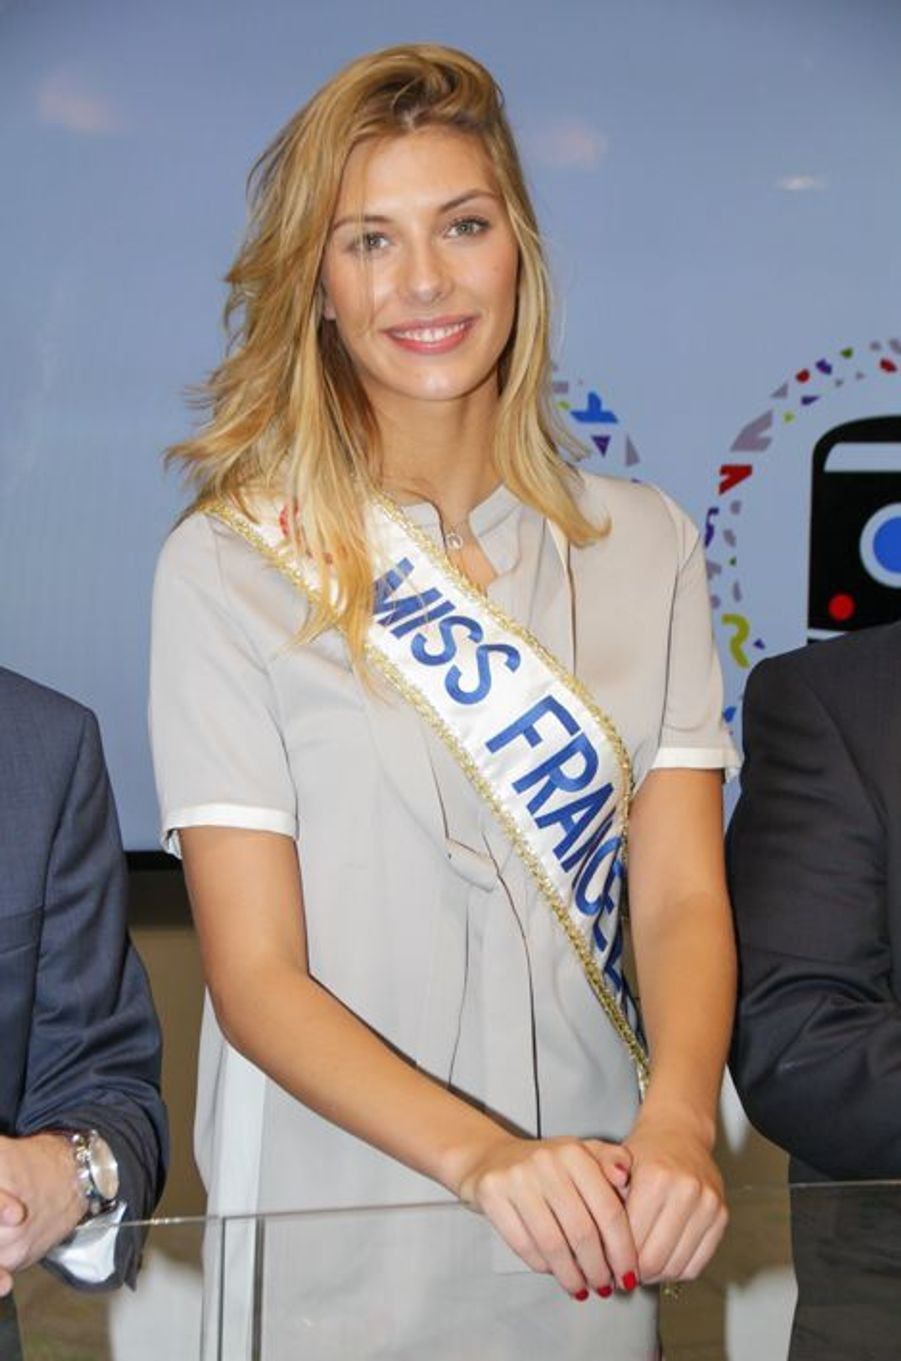 Camille Cerf à Cannes le 11 mars 2015